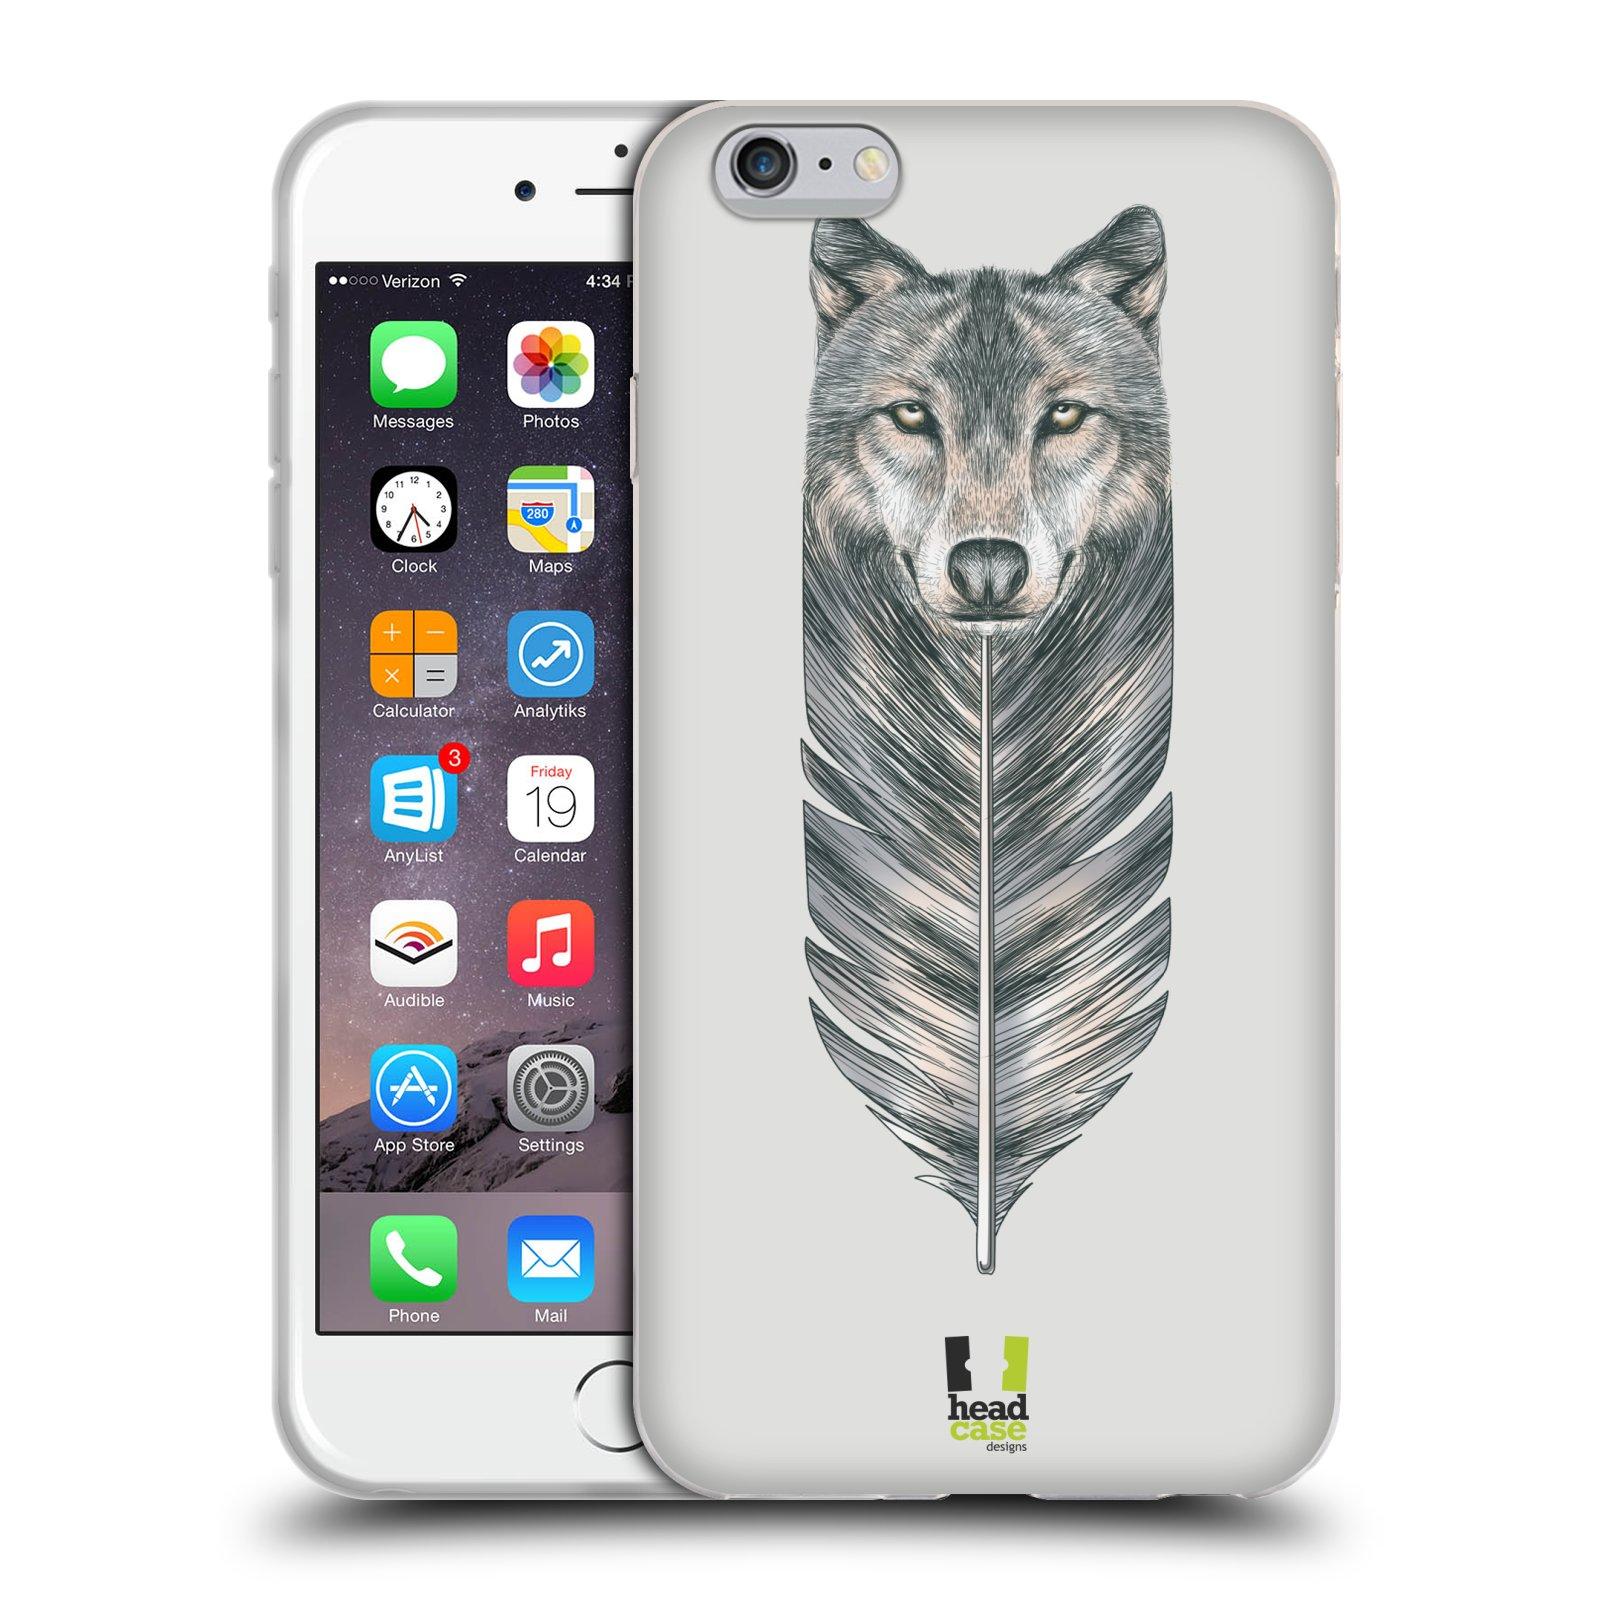 HEAD CASE silikonový obal na mobil Apple Iphone 6 PLUS  6S PLUS vzor  zvířecí pírka vlk 7995120acf5